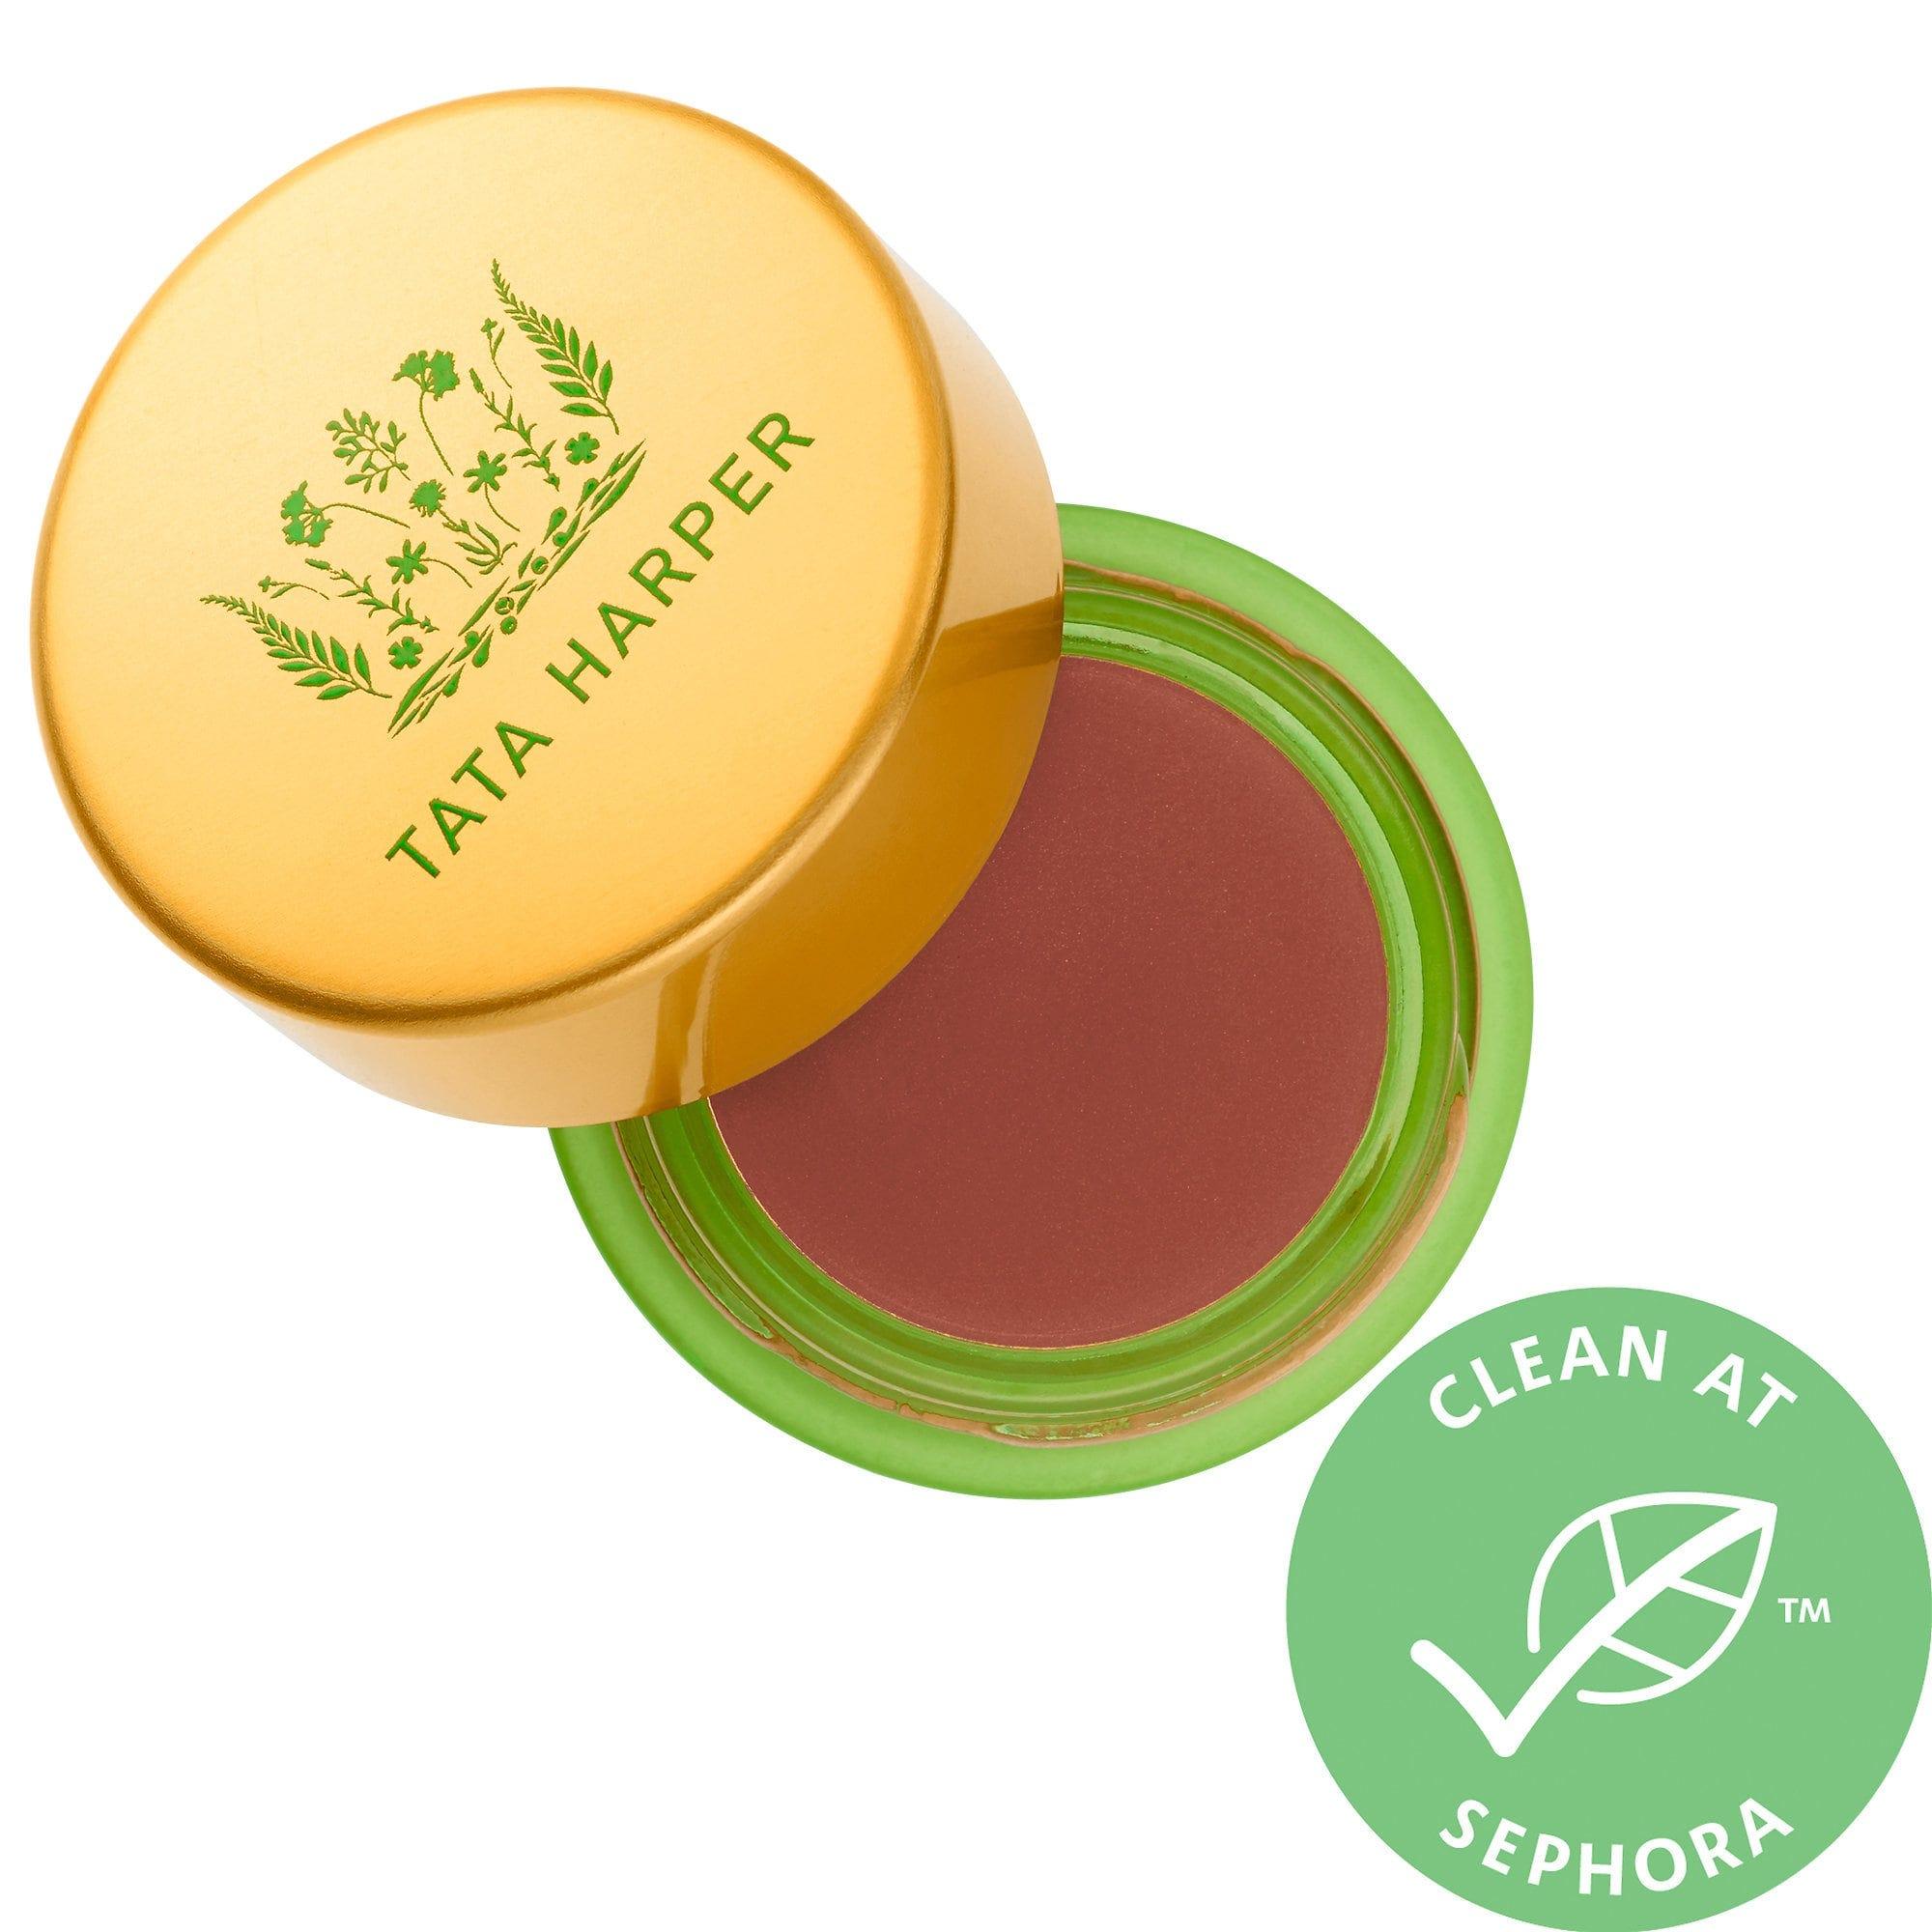 Volumizing Lip & Cheek Tint in Very Popular